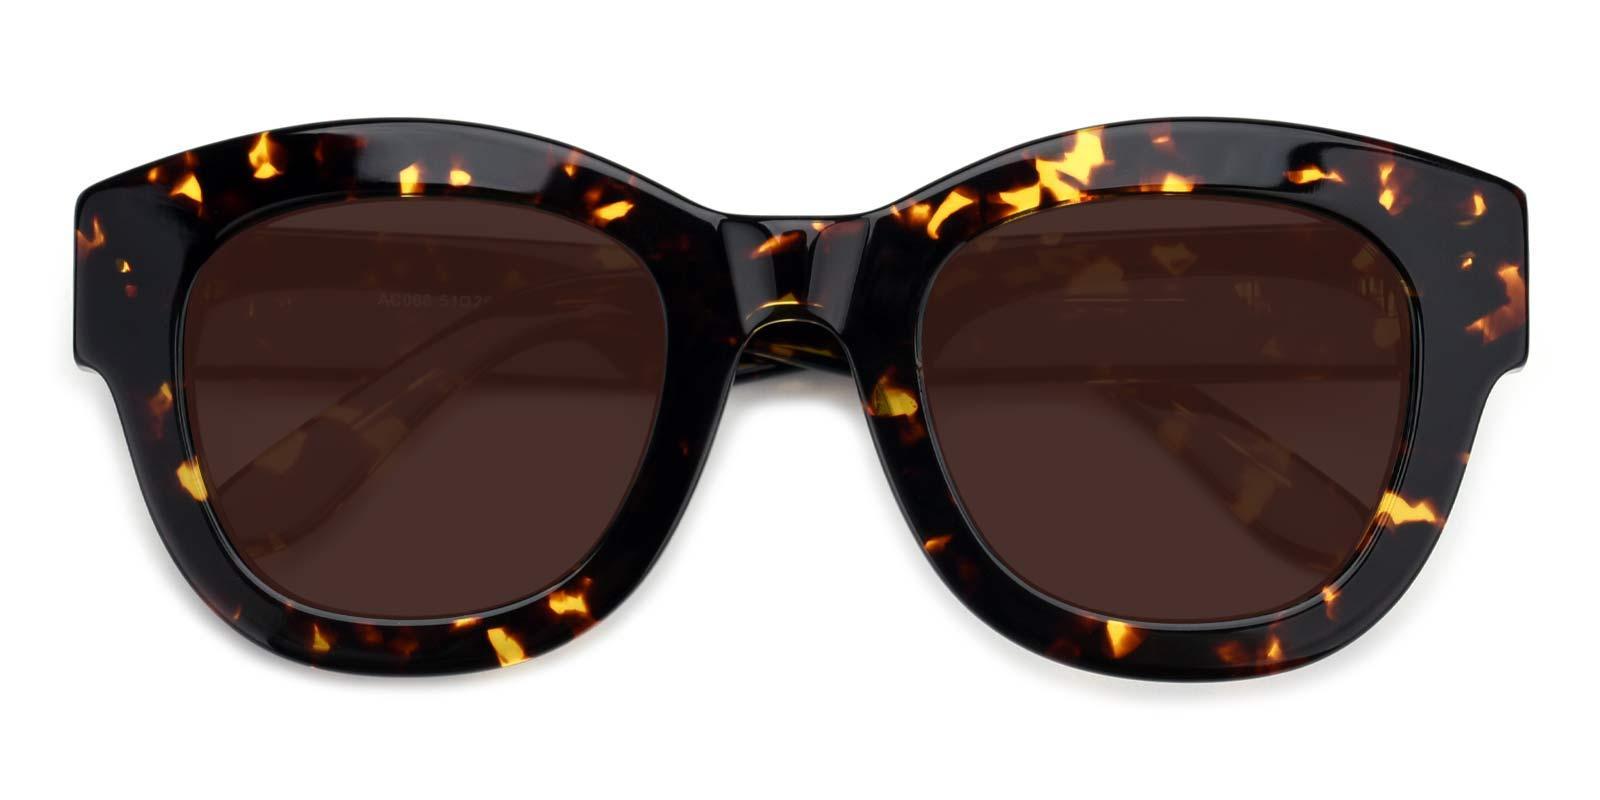 Egypt-Tortoise-Cat-Acetate-Sunglasses-detail